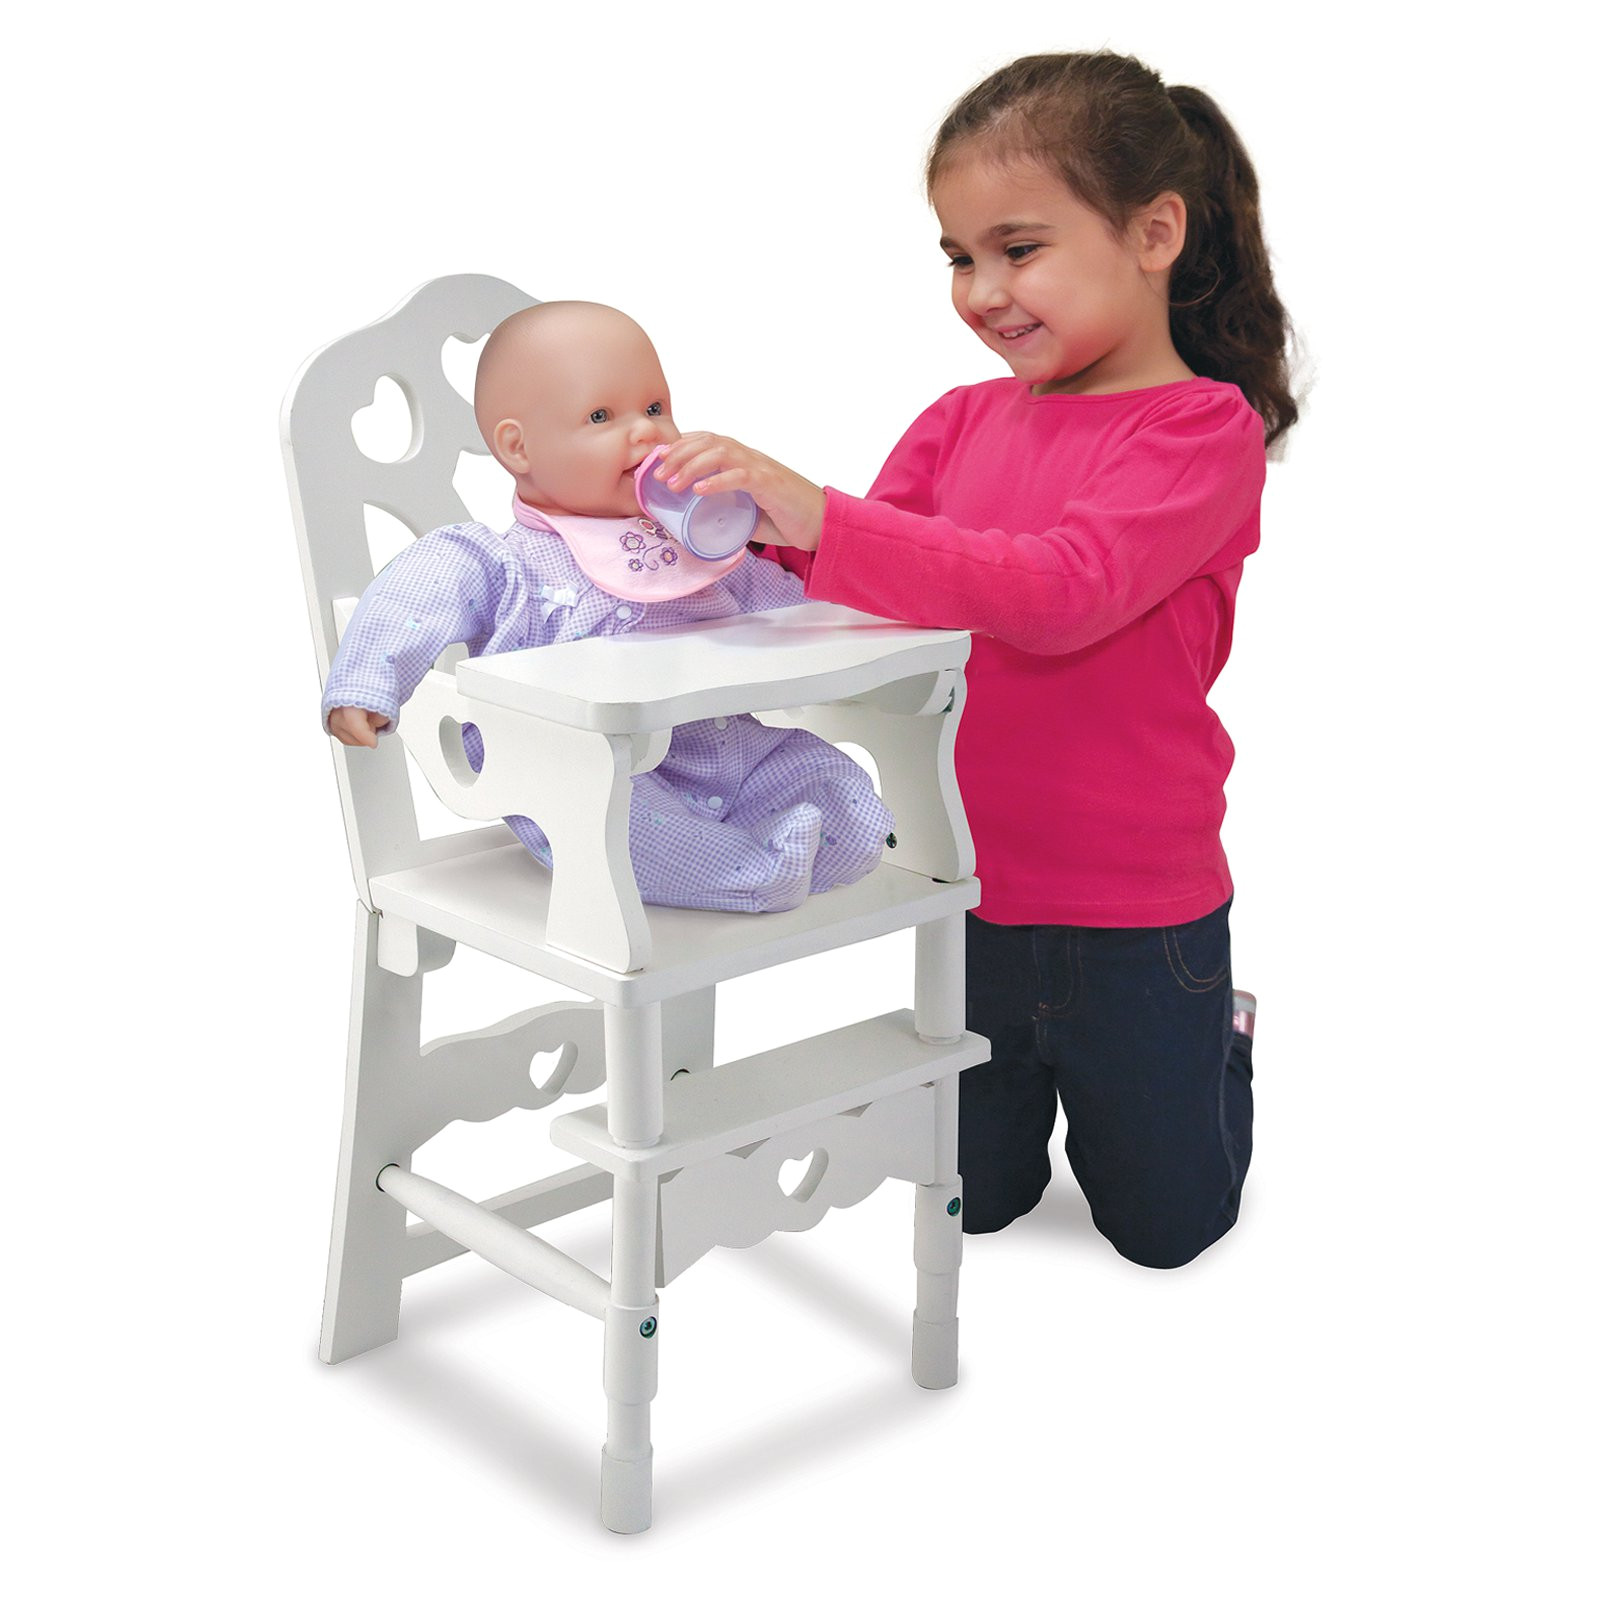 Baby Doll High Chair Walmart Melissa and Doug Wooden Doll High Chair Hayneedle